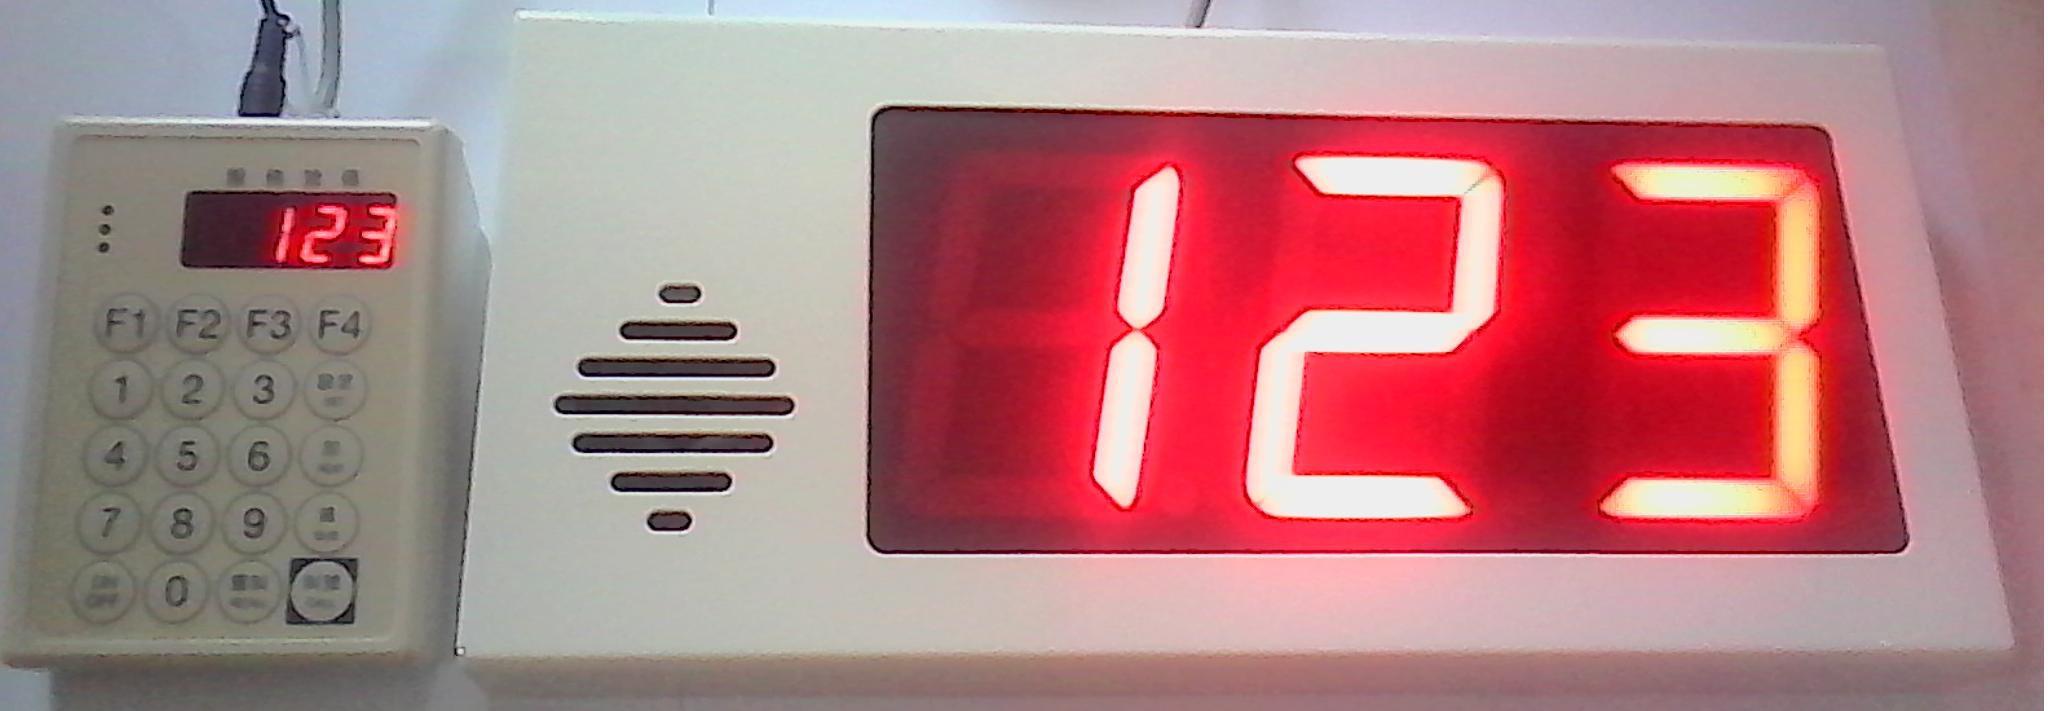 LED叫號機 – 晶霖企業有限公司